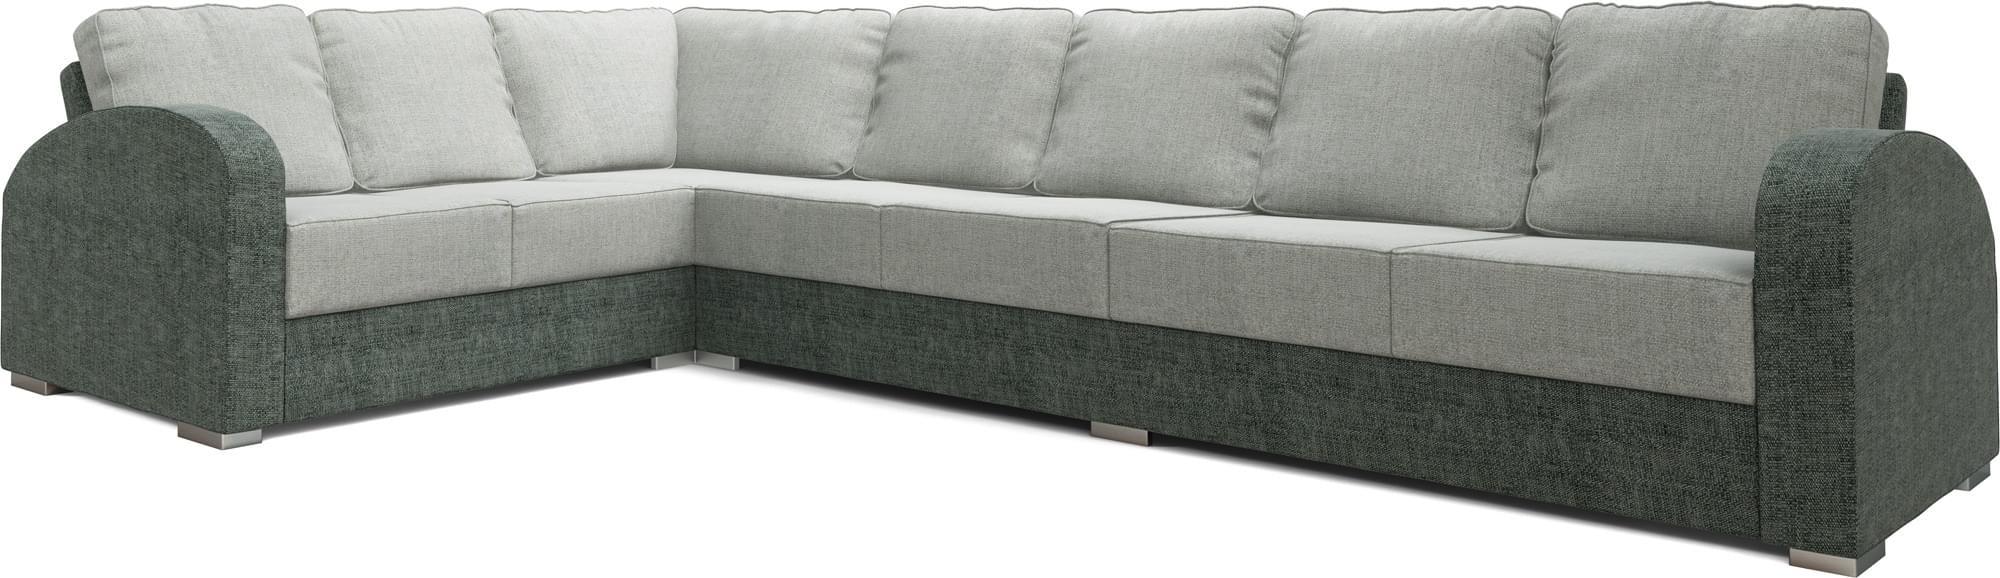 Orb 5X3 Corner Sofa